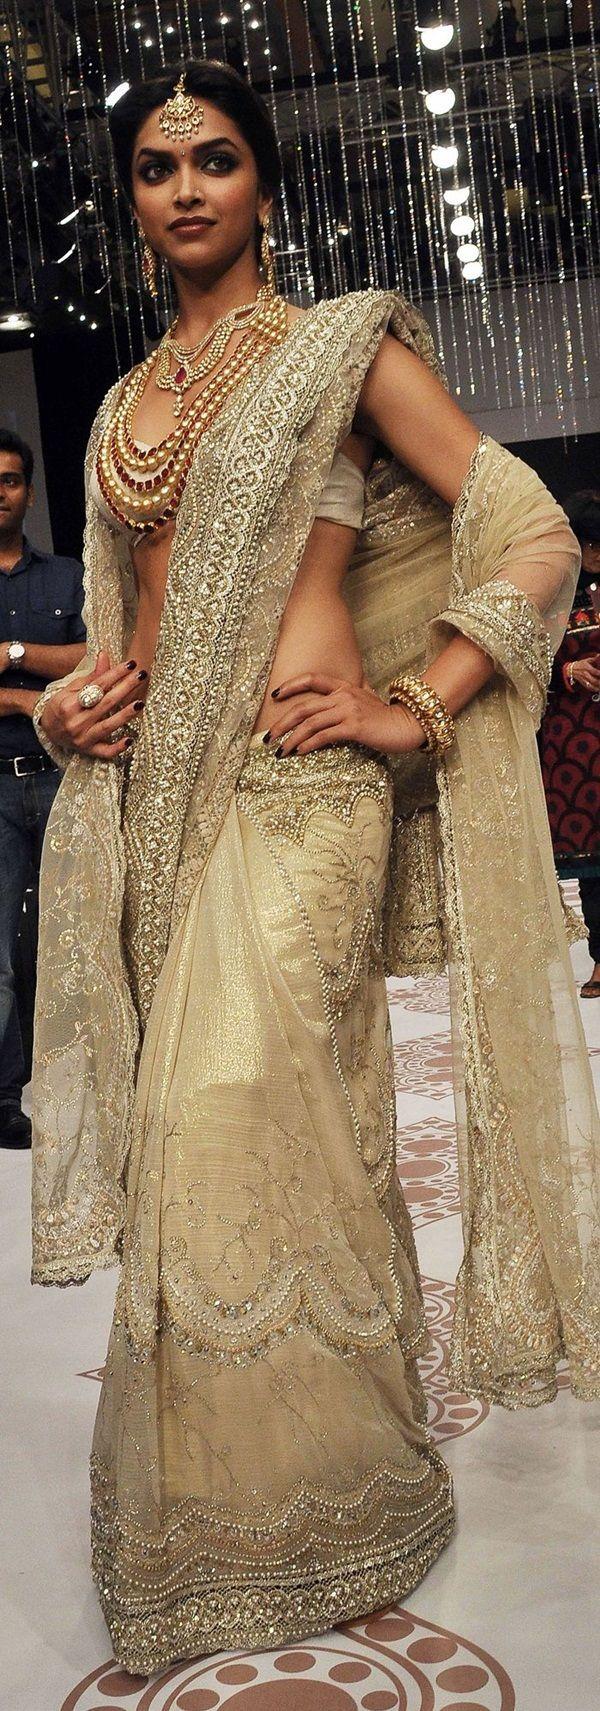 Beautiful Models in Saree-1